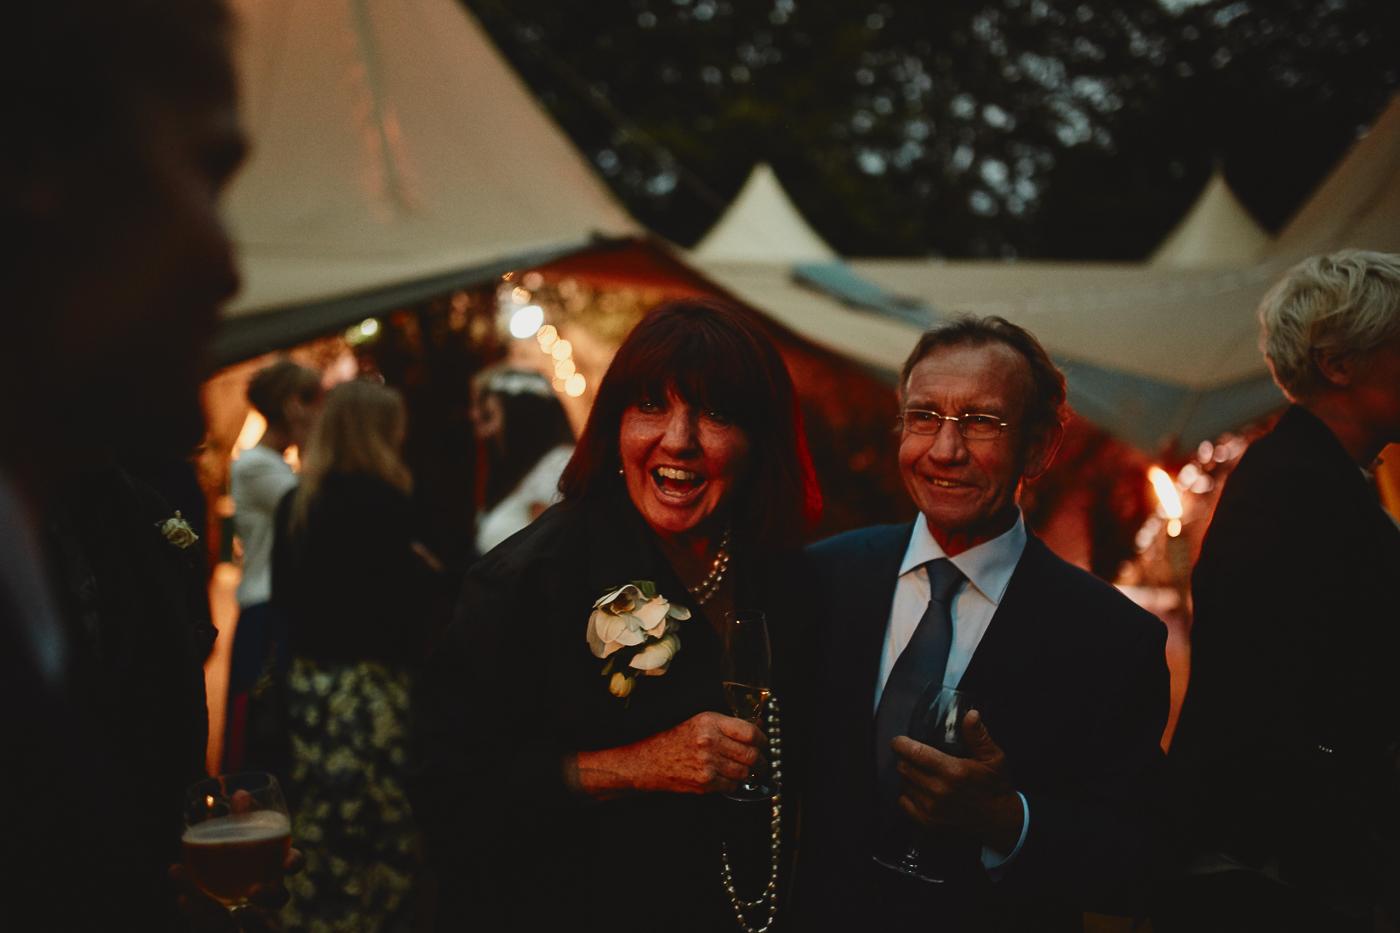 Danni_And_Jack_Gloucester_Wedding-145.jpg